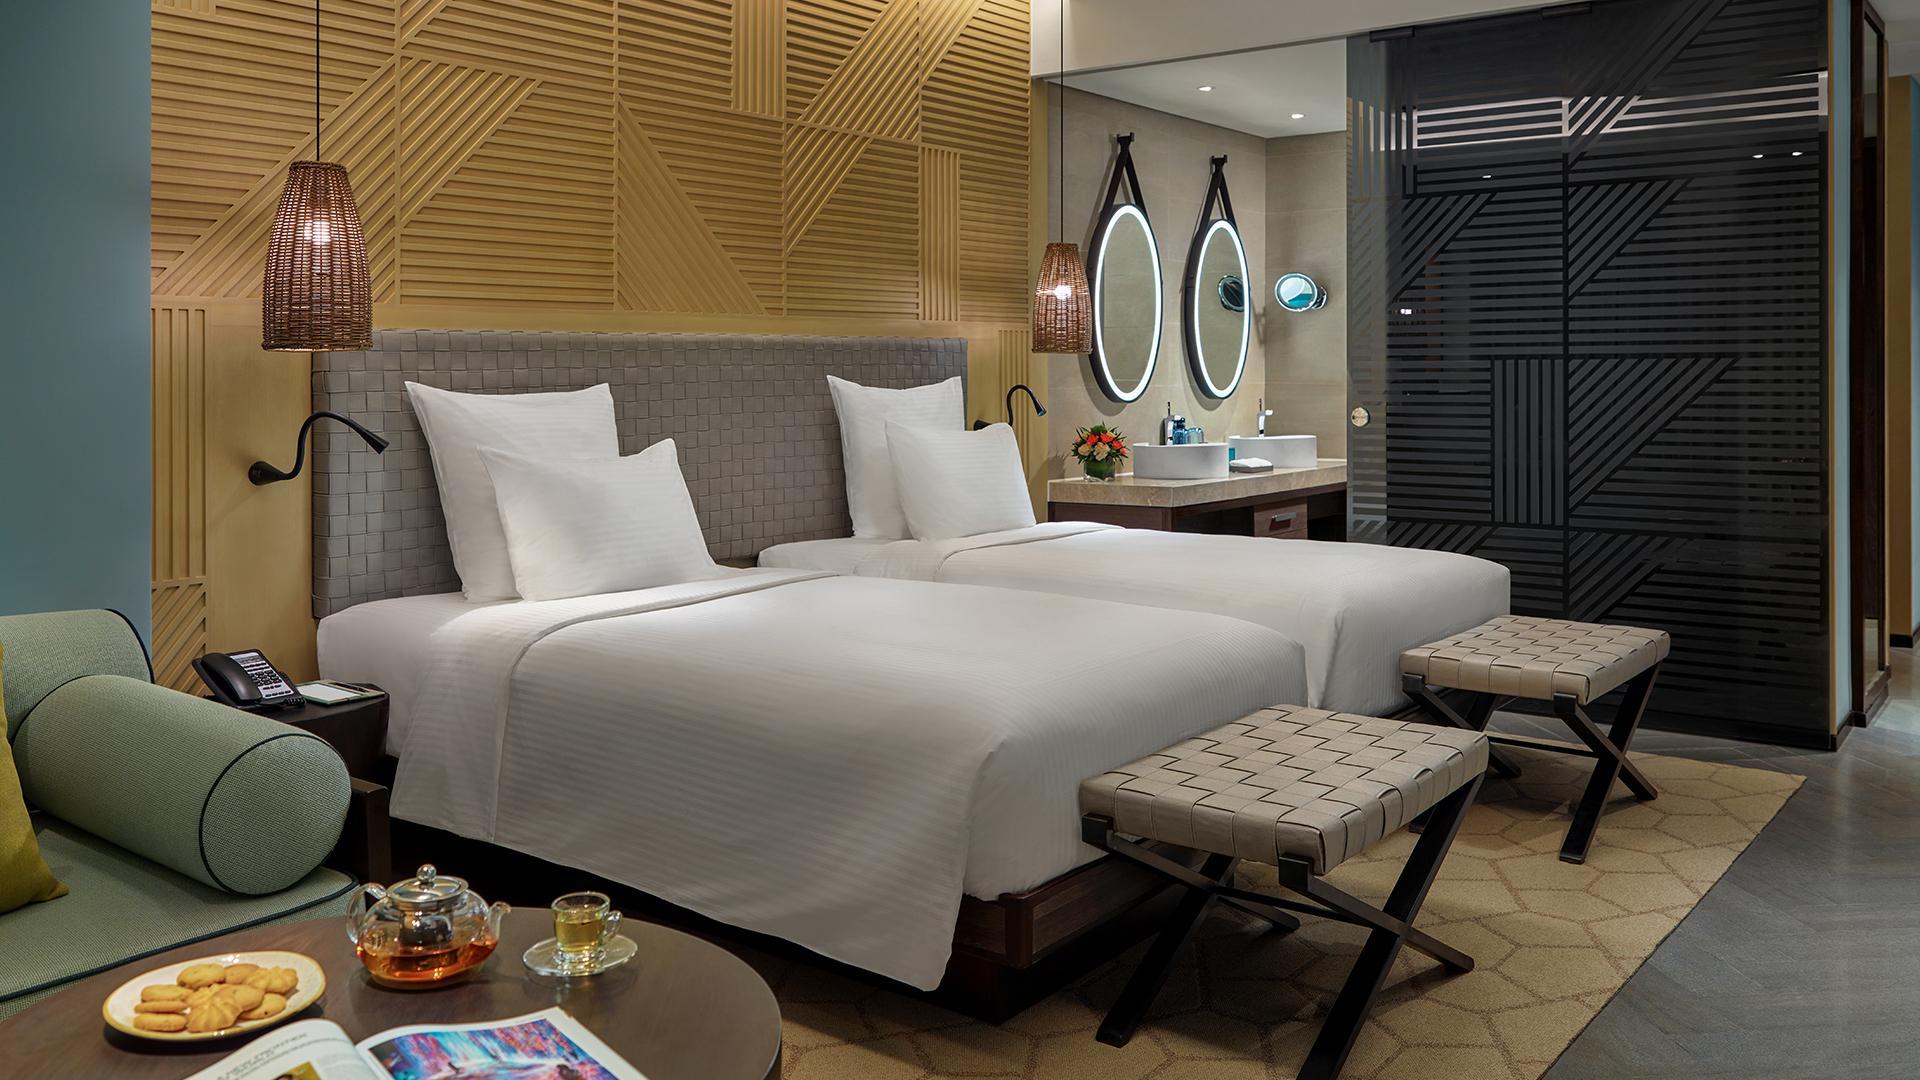 Superior Room image 1 at Pullman Phu Quoc Beach Resort by null, tỉnh Kiên Giang, Vietnam